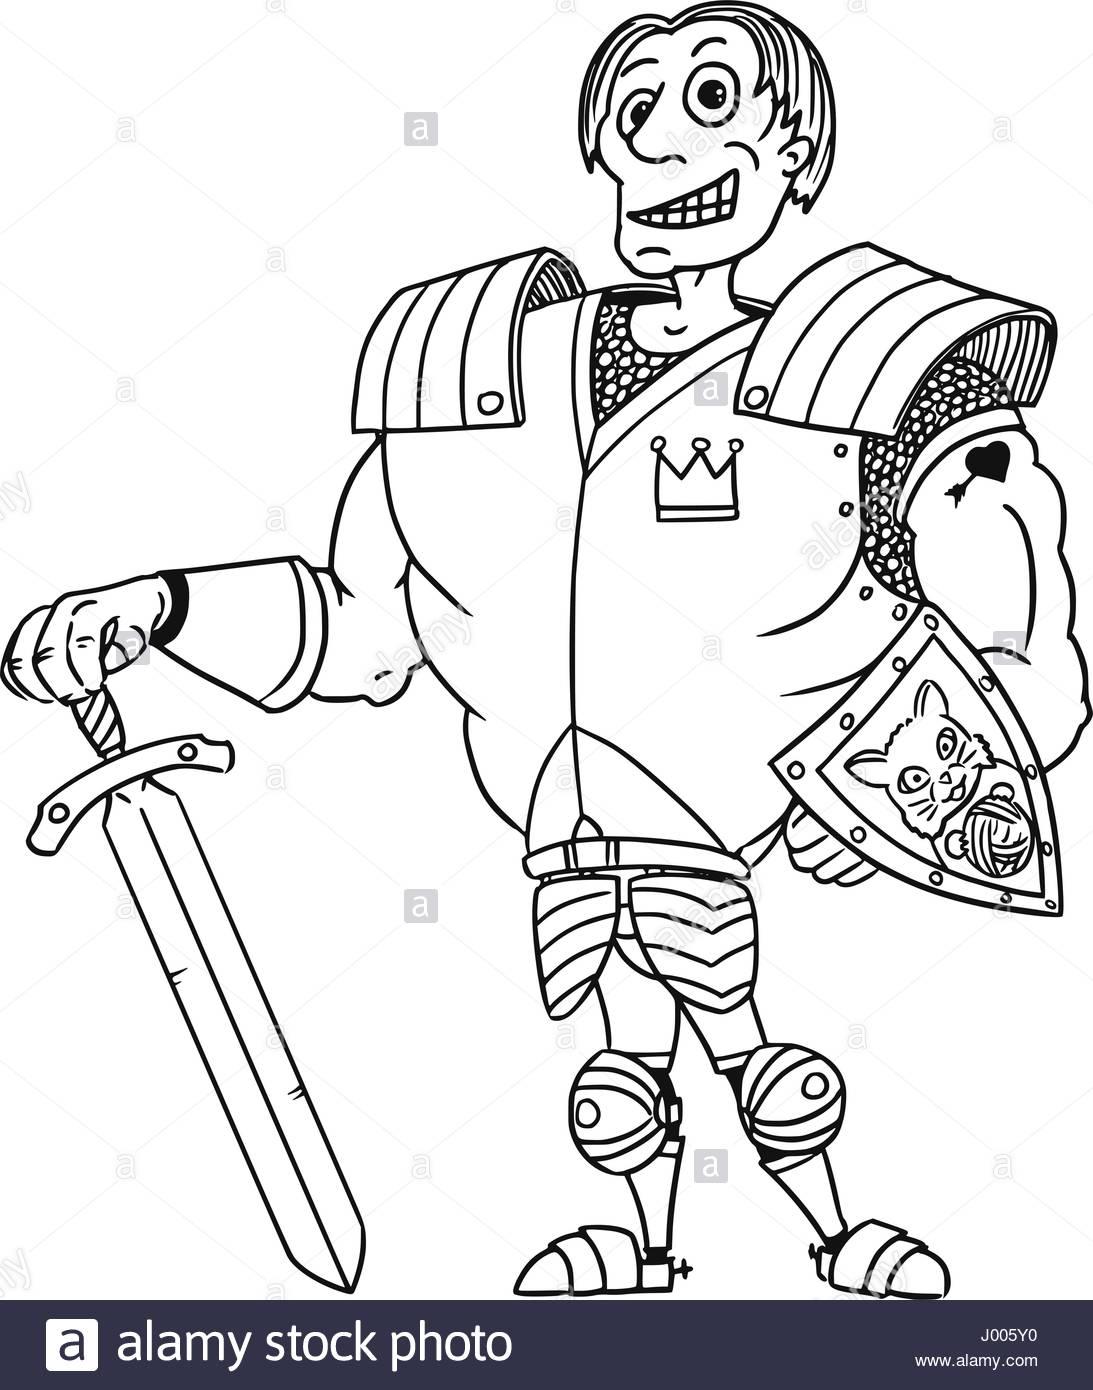 1093x1390 Cartoon Vector Old Fantasy Medieval Royal Prince Charming Knight